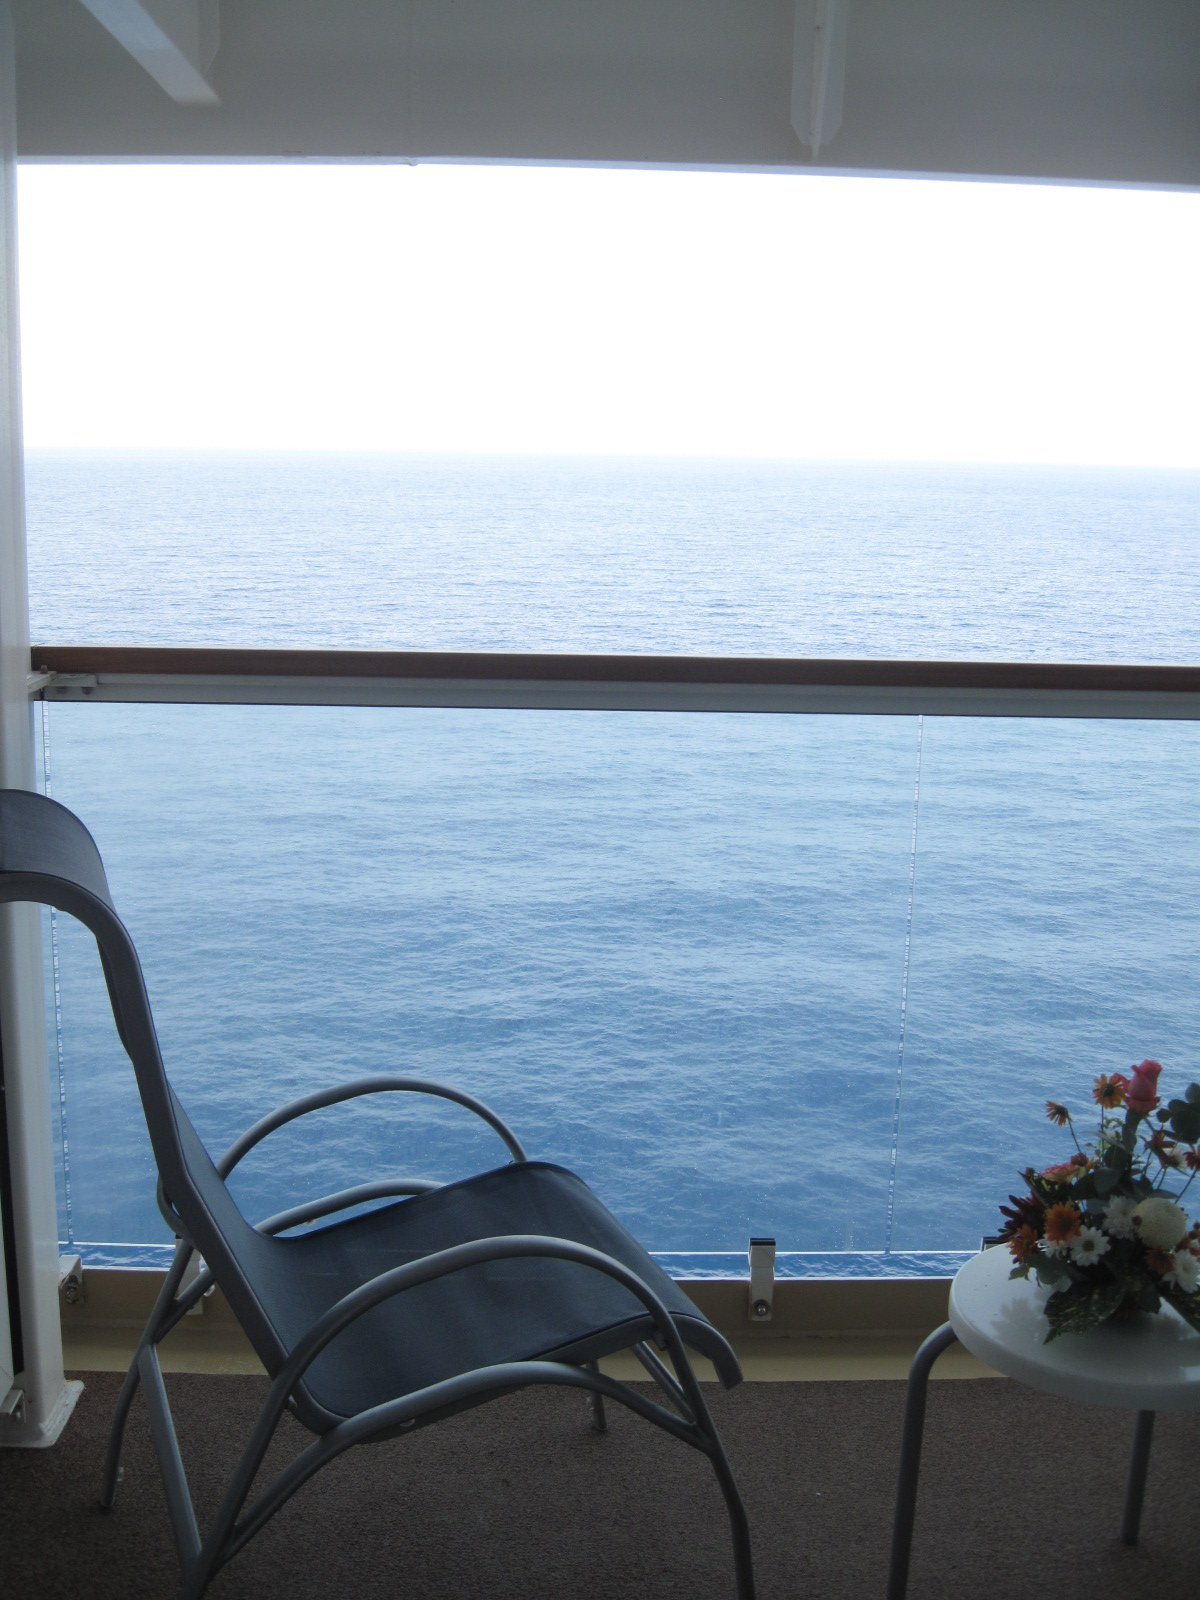 07/11/2011 - Navigazione-img_0610-jpg